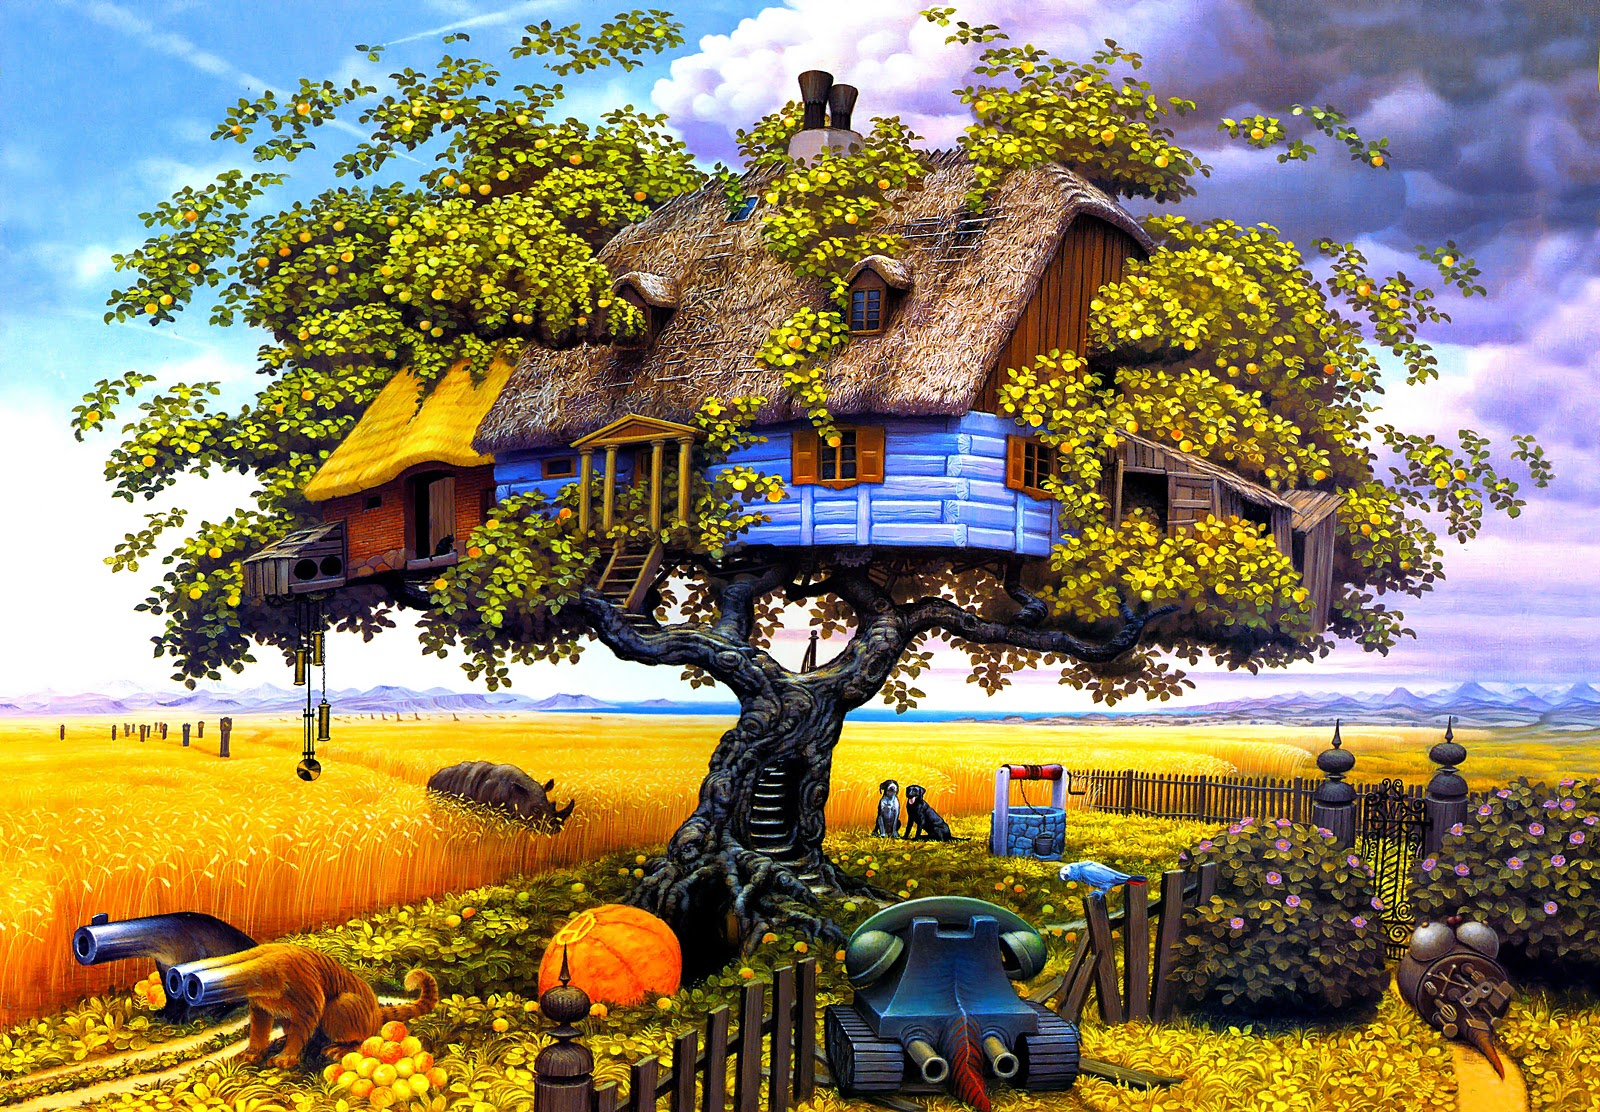 Imagination-creativity-tree-house-image-picture-1600x1112.jpg